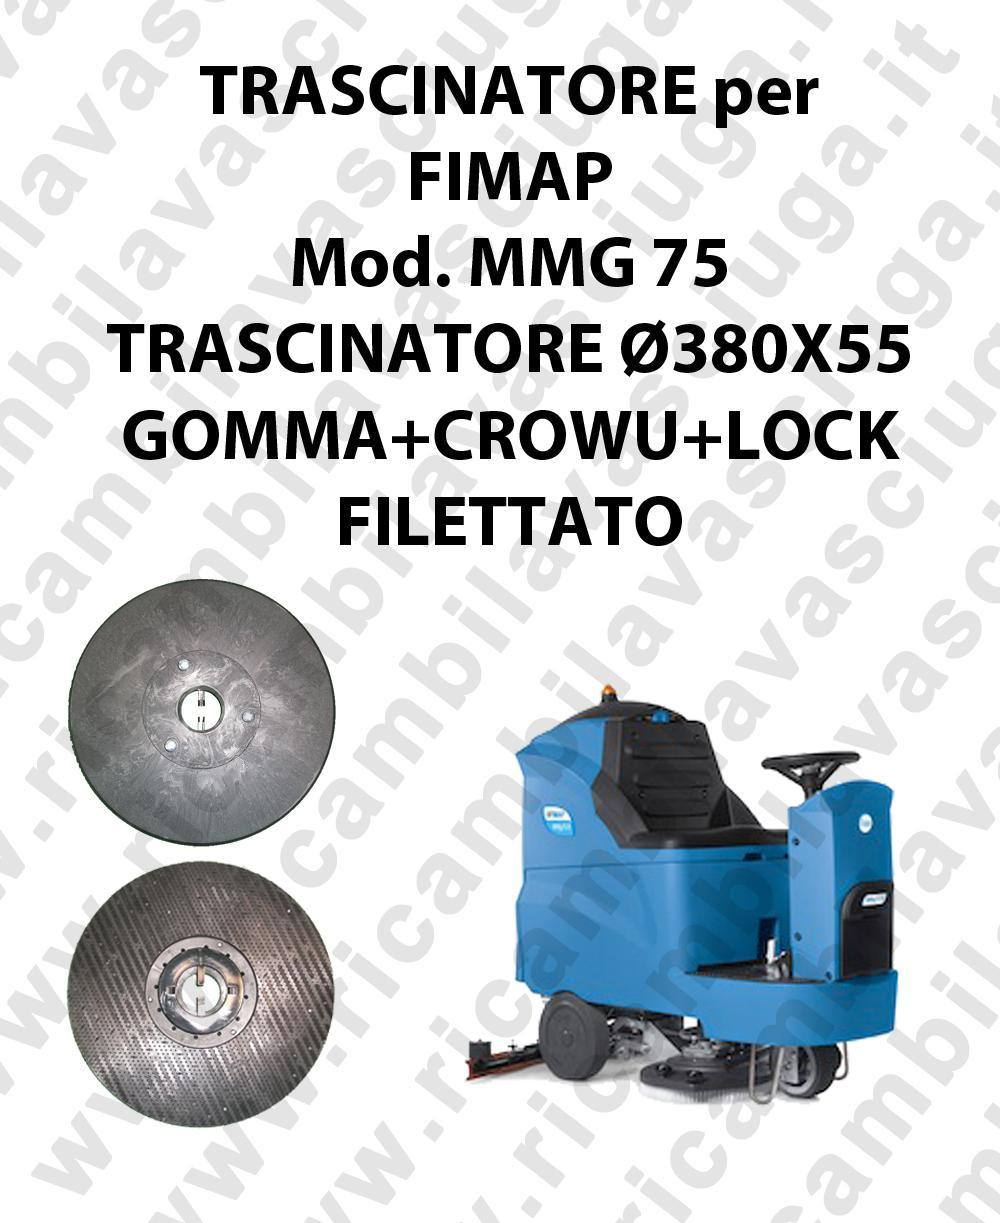 Padholder for scrubber dryer FIMAP model MMG 75